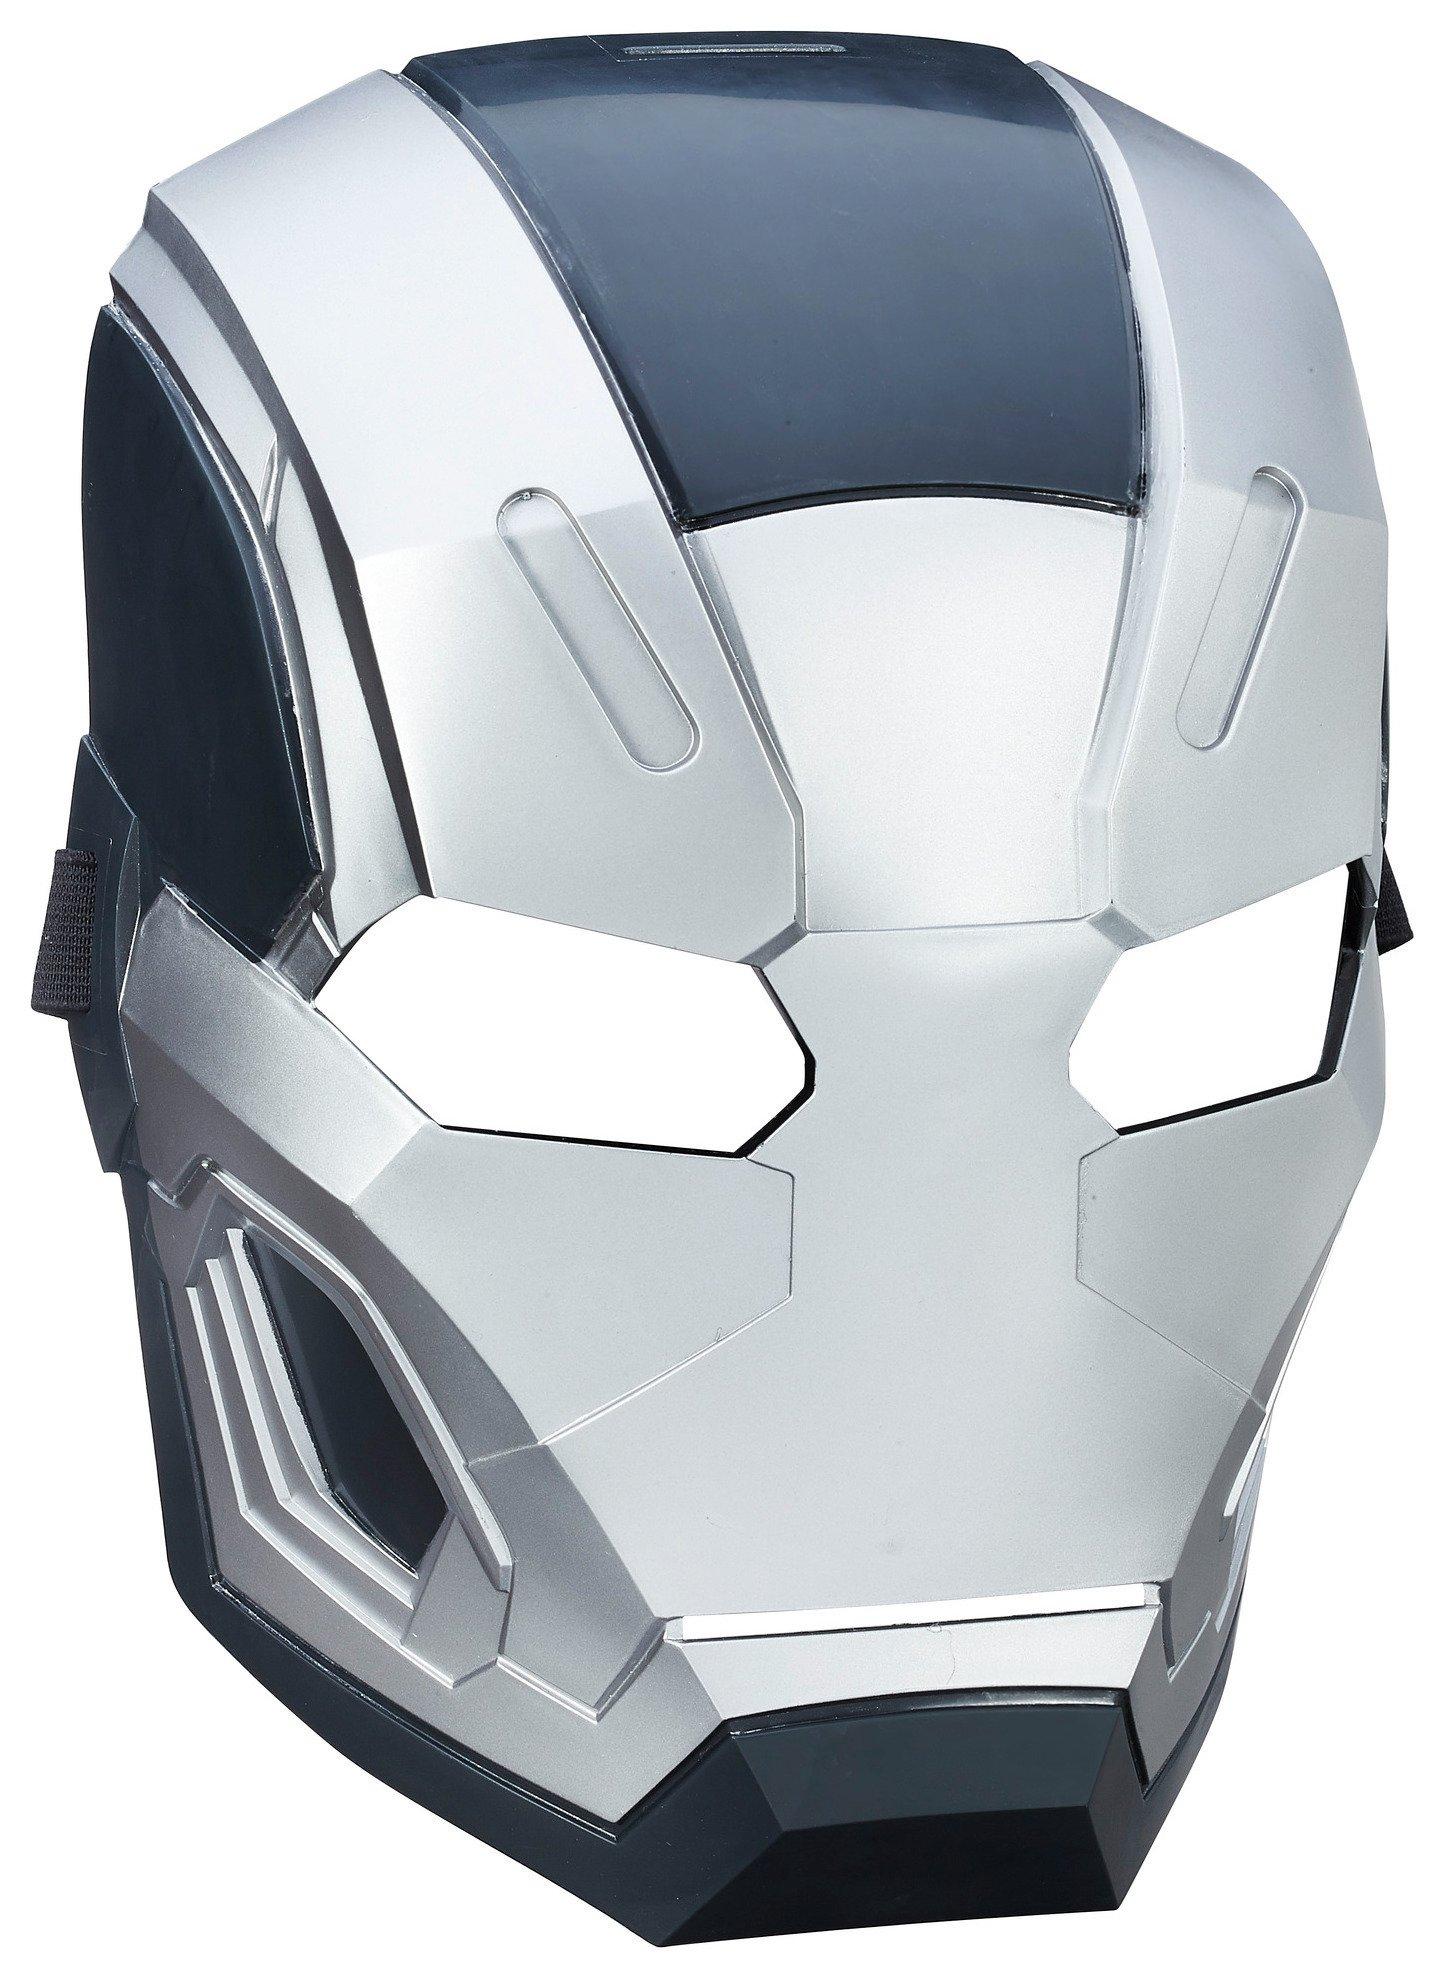 Image of Marvel Captain America: Civil War Marvel's War Machine Mask.